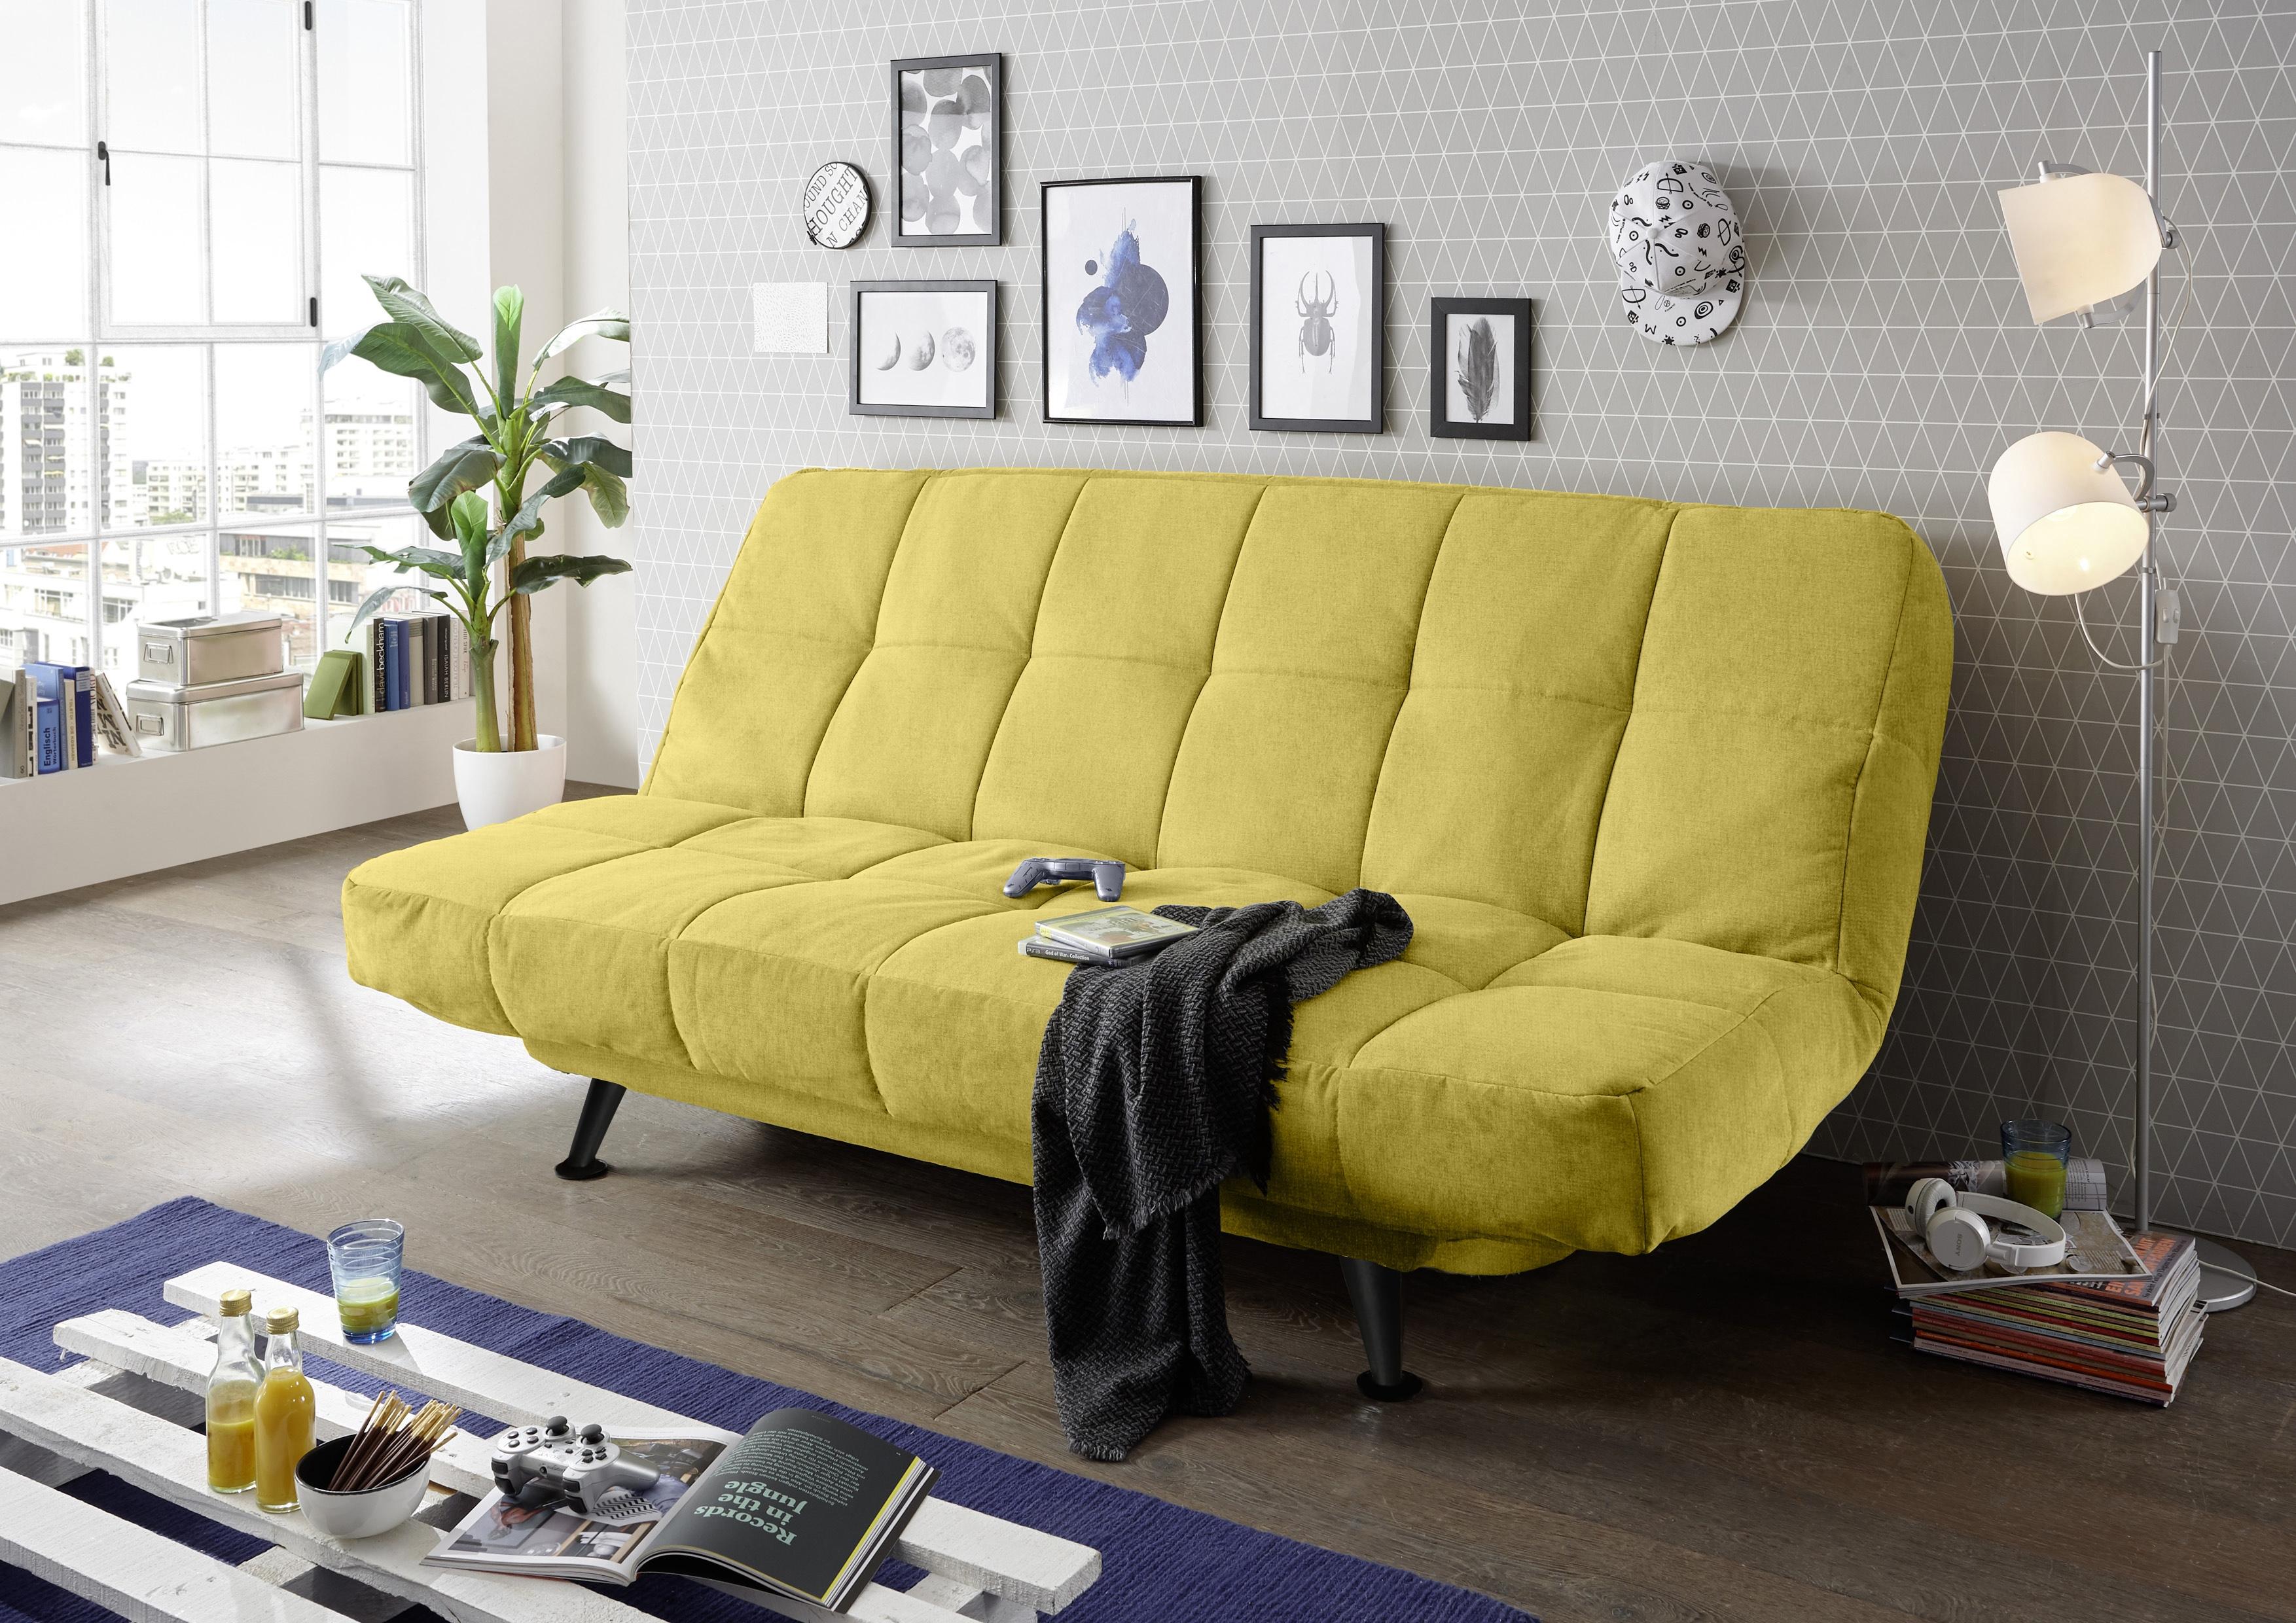 Canapea extensibila cu lada de depozitare, tapitata cu stofa, 3 locuri Ikaris 2 Mustariu, l208xA98xH102 cm poza